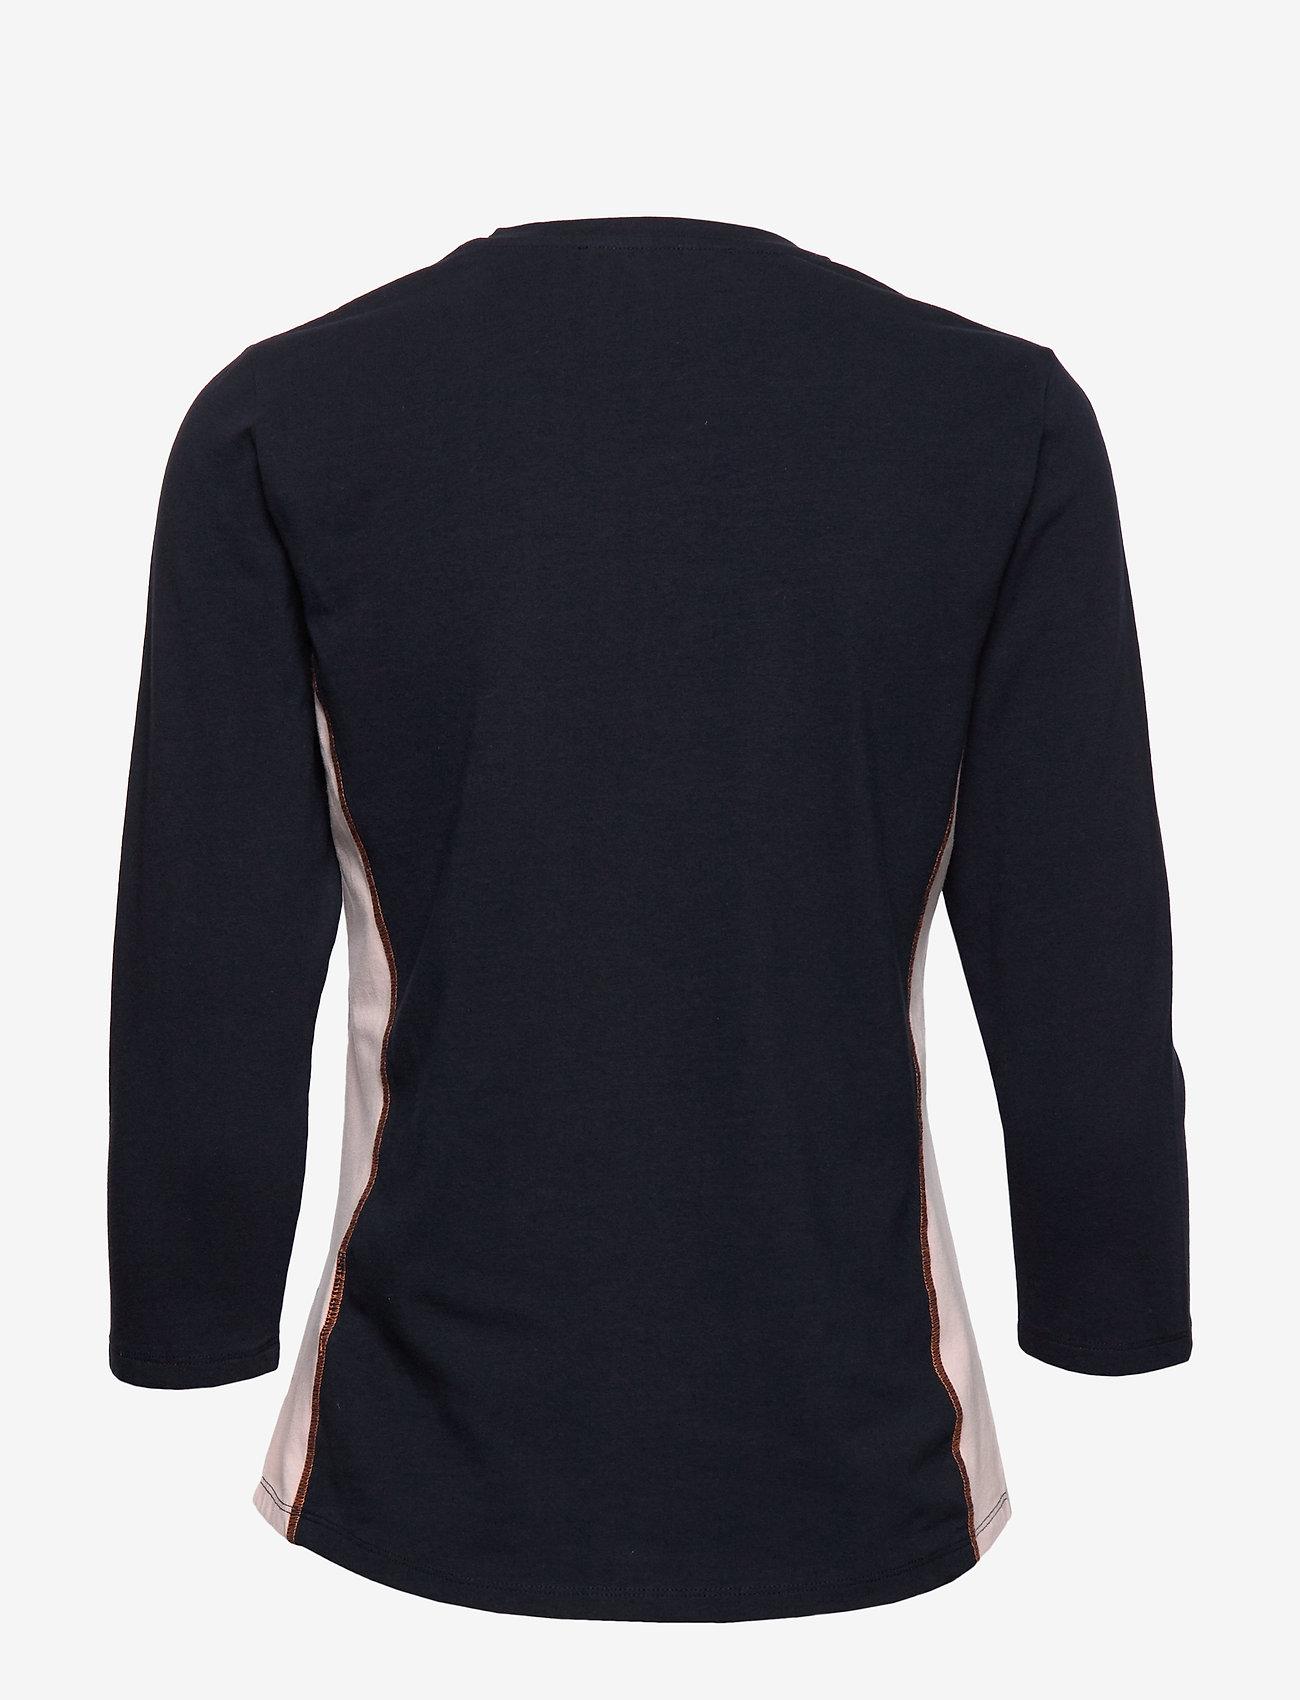 Shirt Long 3/4 Sleeve (Dark Blue/orange) - Betty Barclay hWKIx0